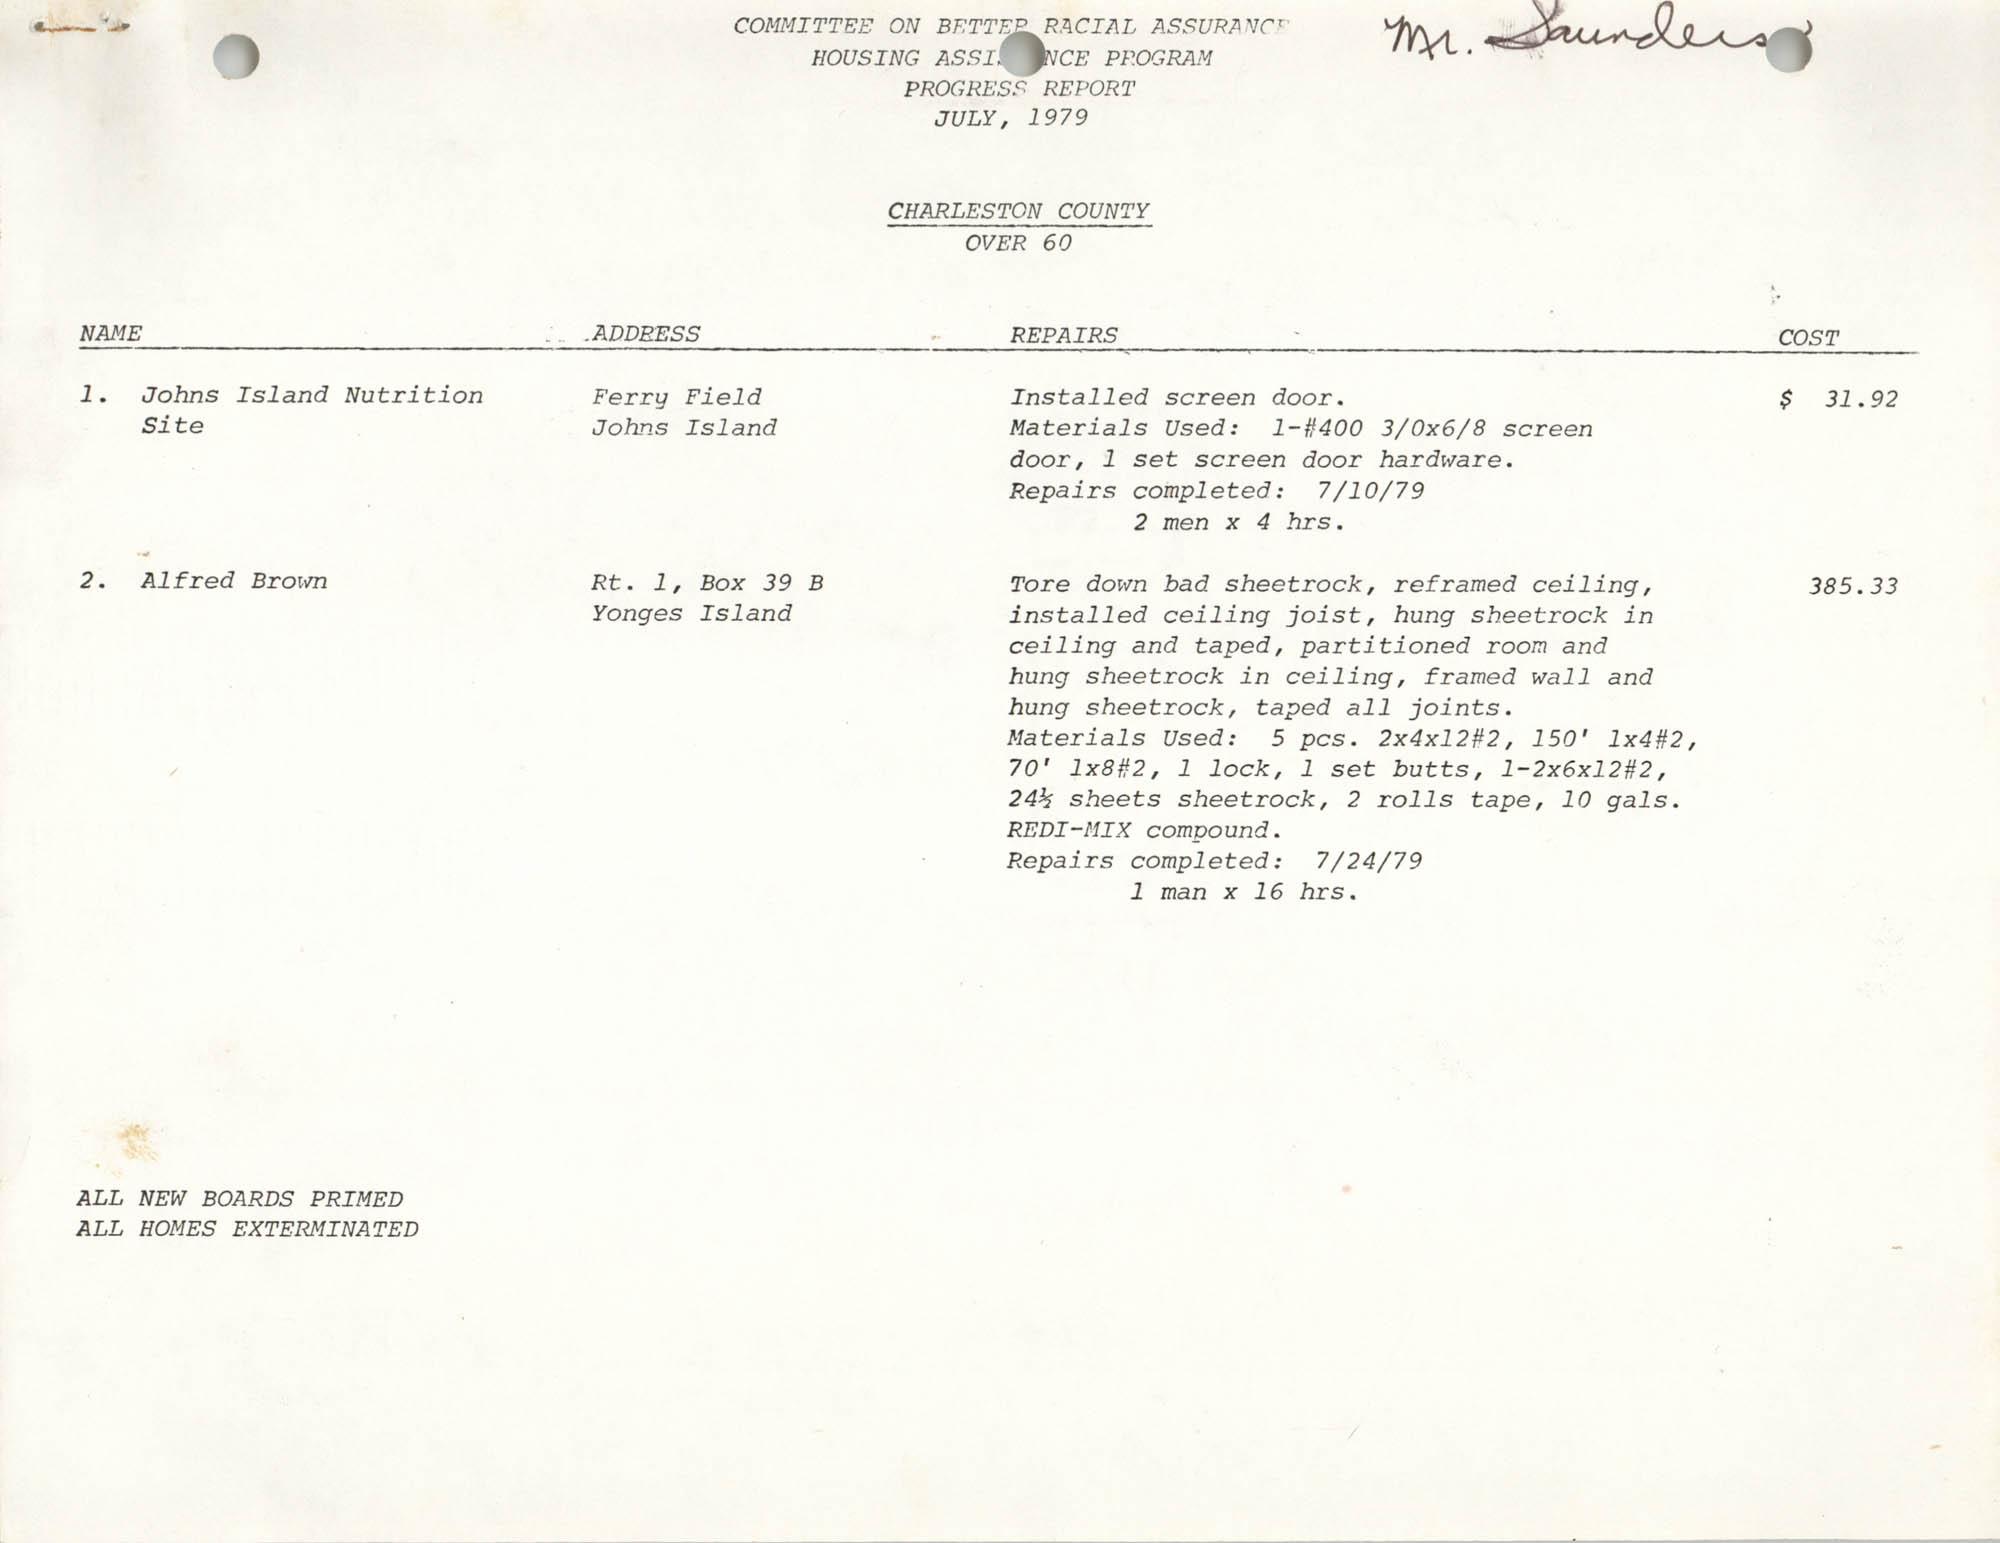 COBRA Housing Assistance Program Progress Report, July 1979